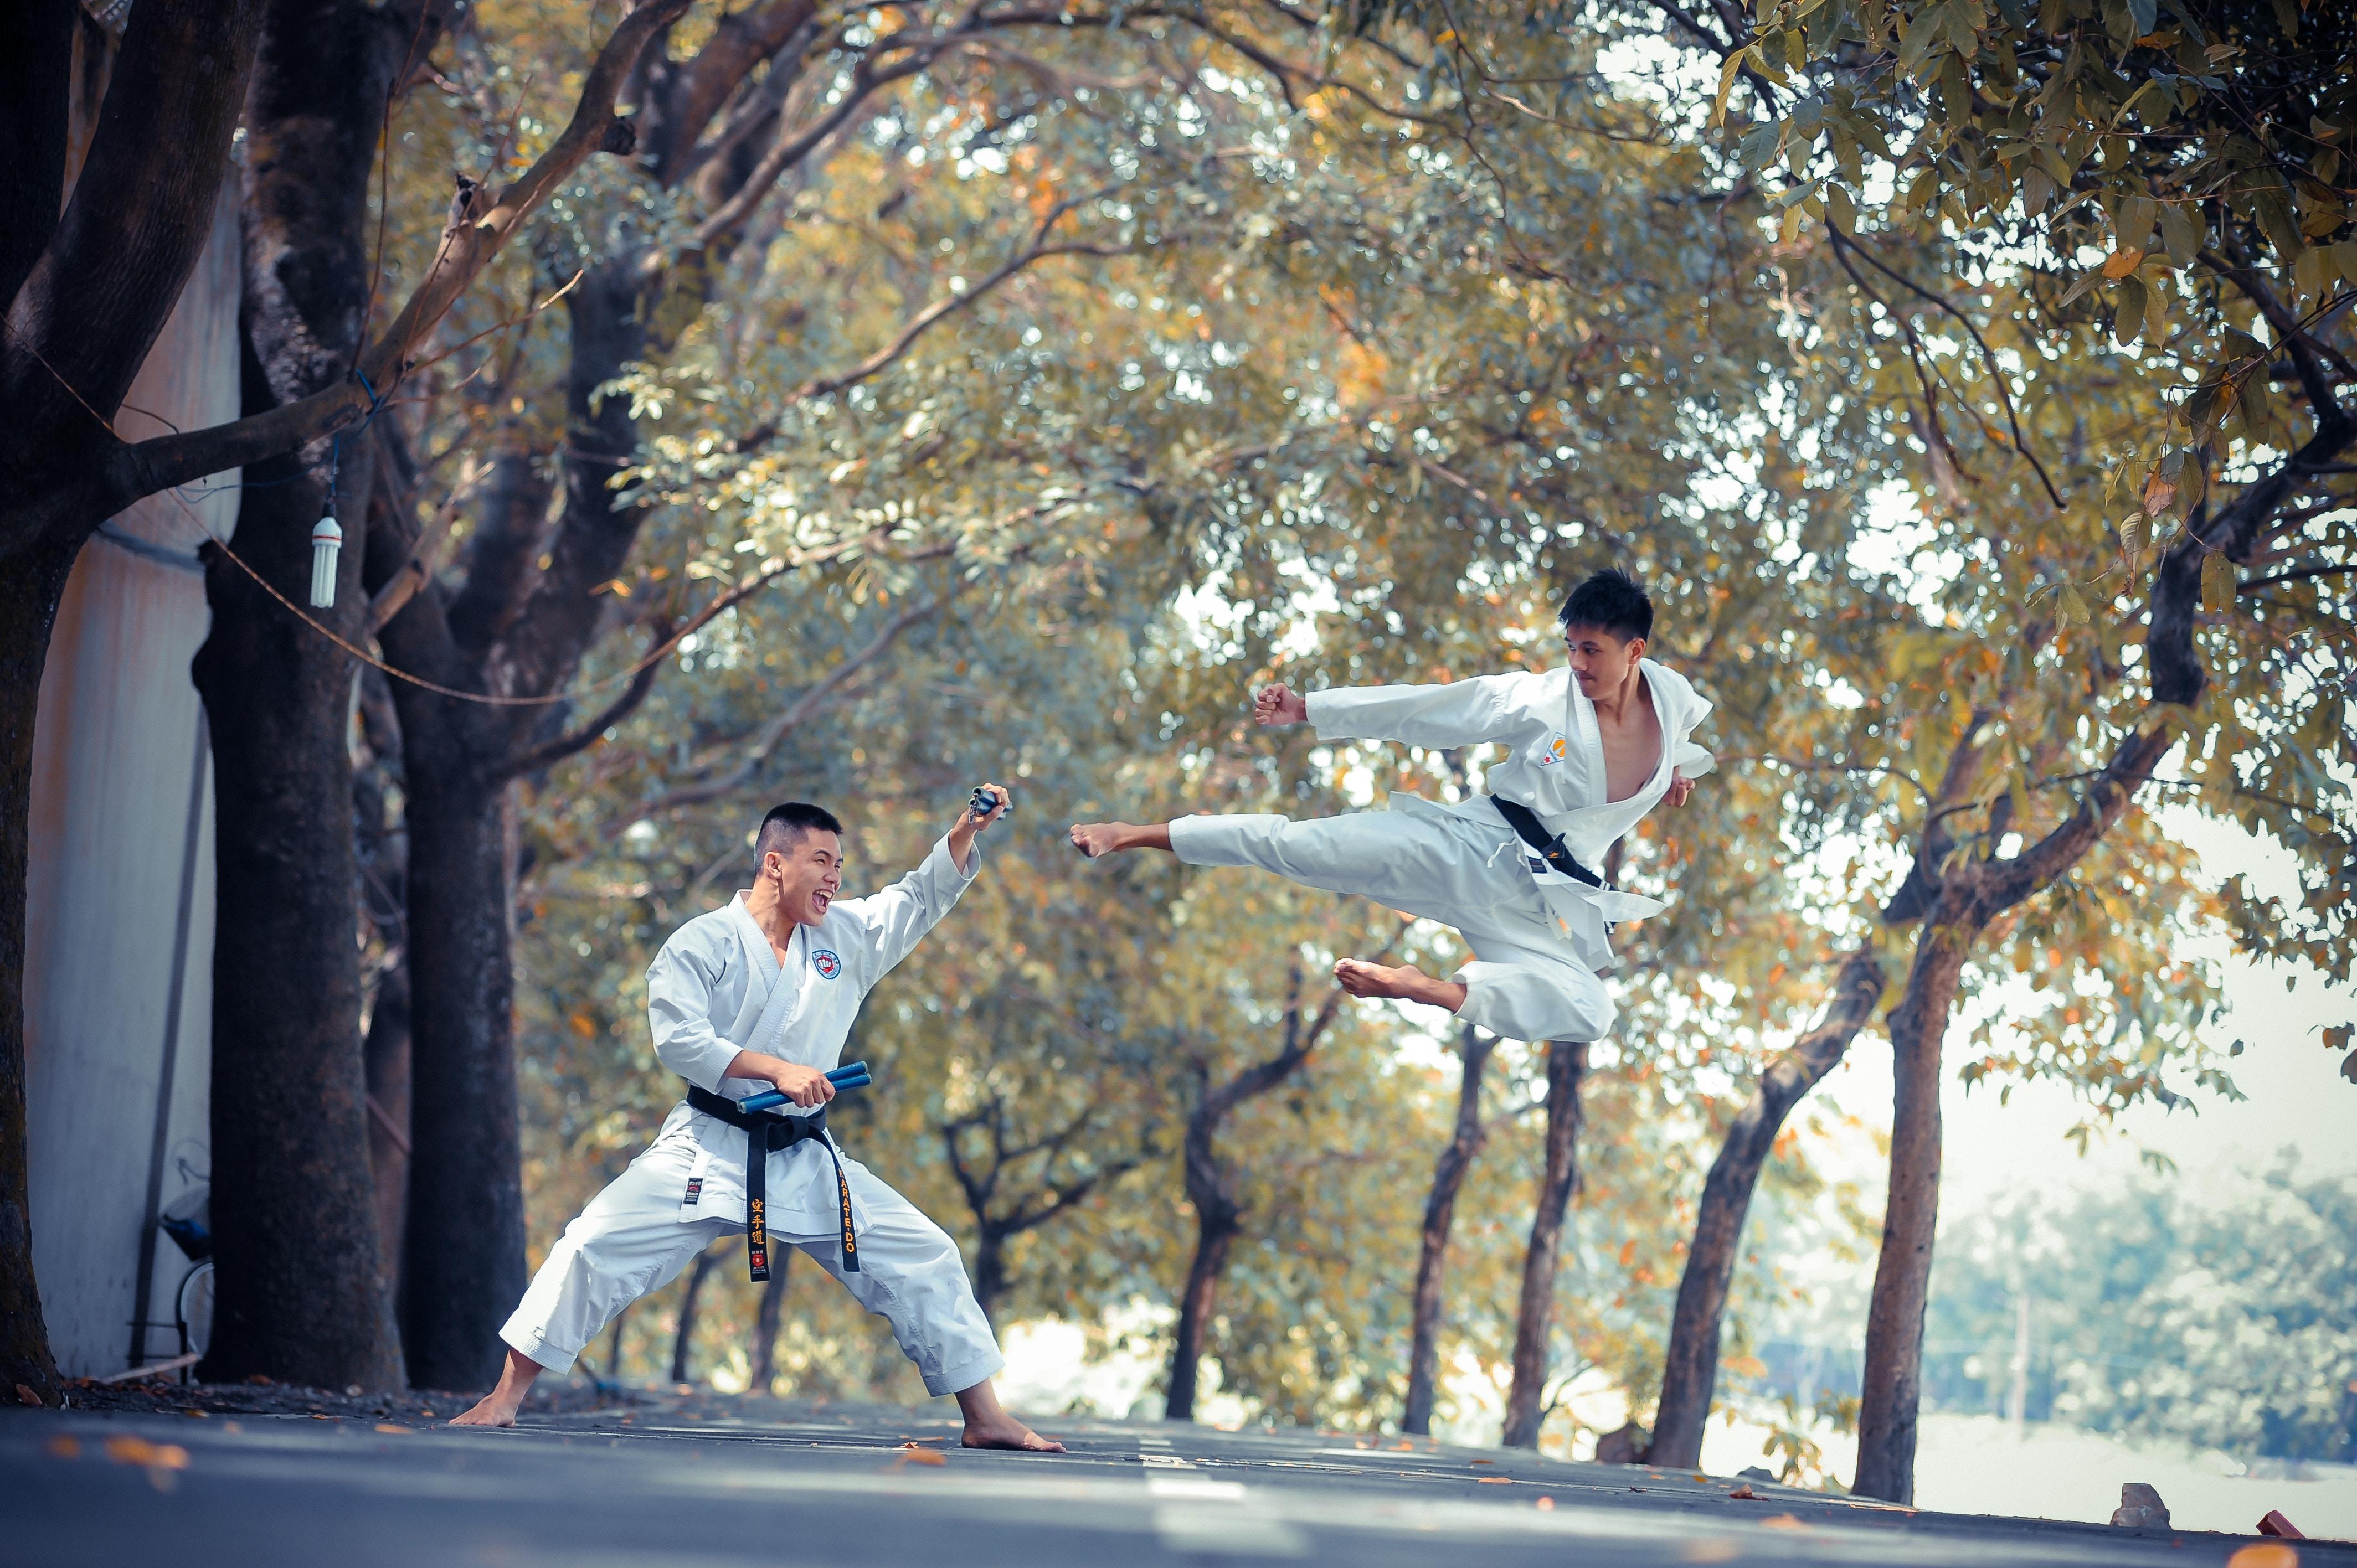 Psychology Wallpaper Quotes Karate Wallpapers 5dwallpaper Com